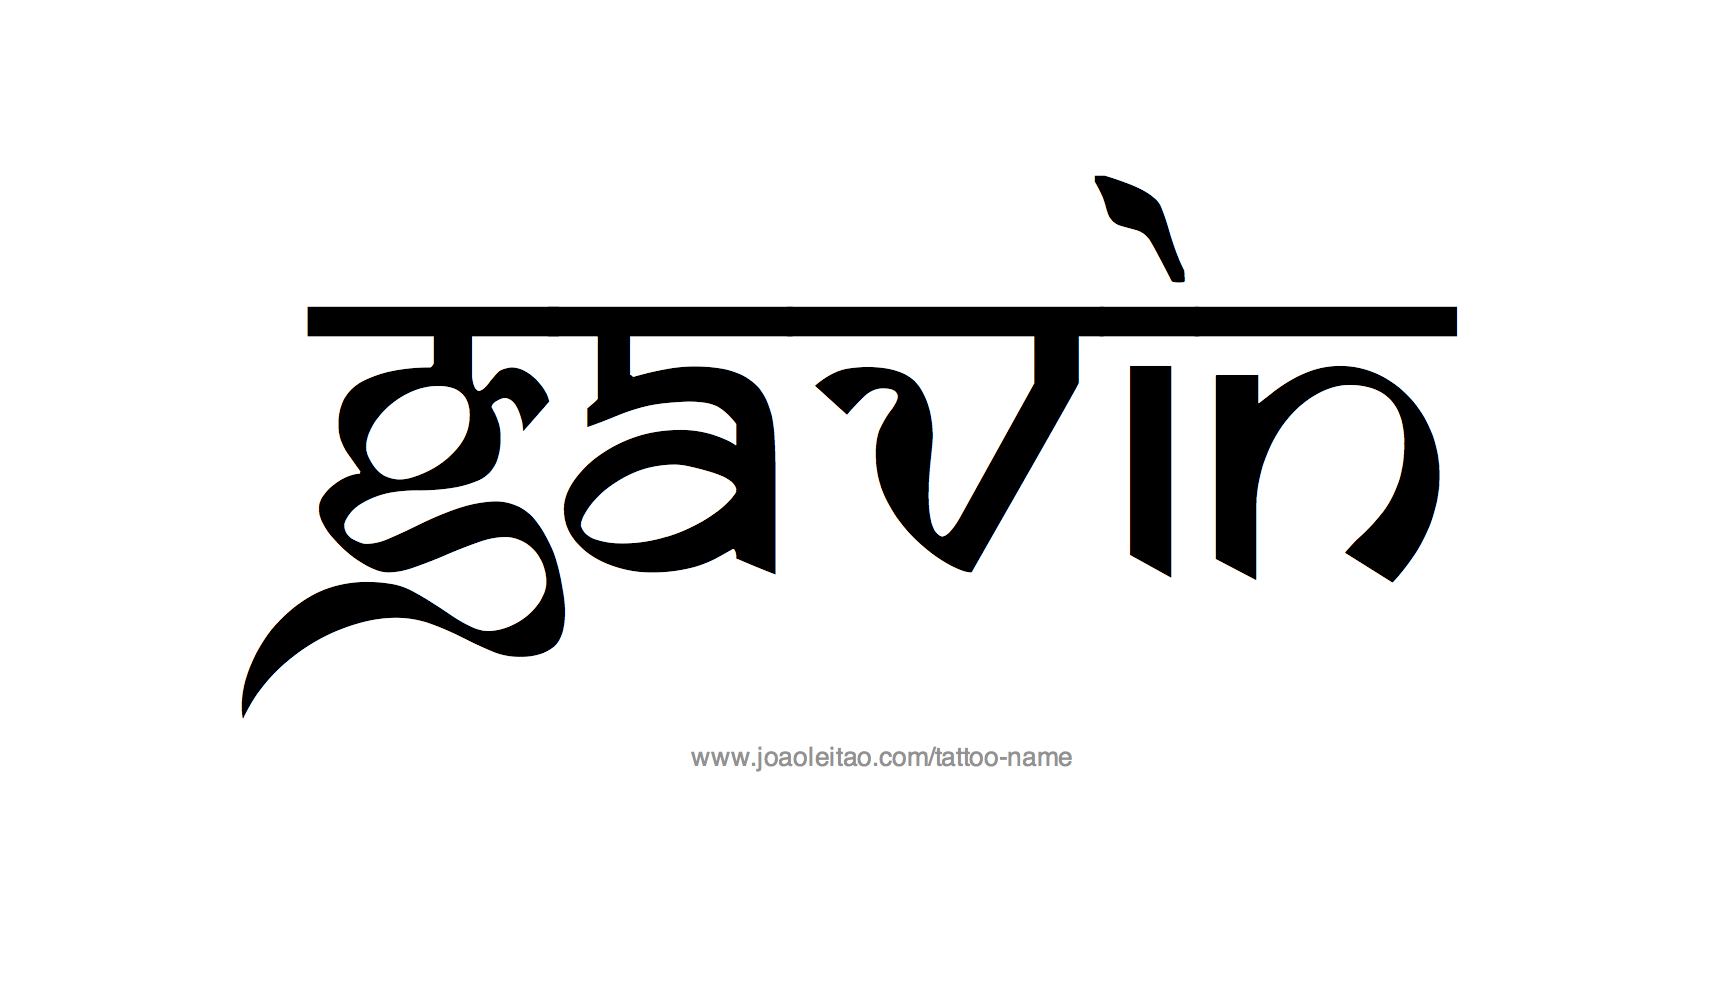 Name: Gavin Name Tattoo Designs